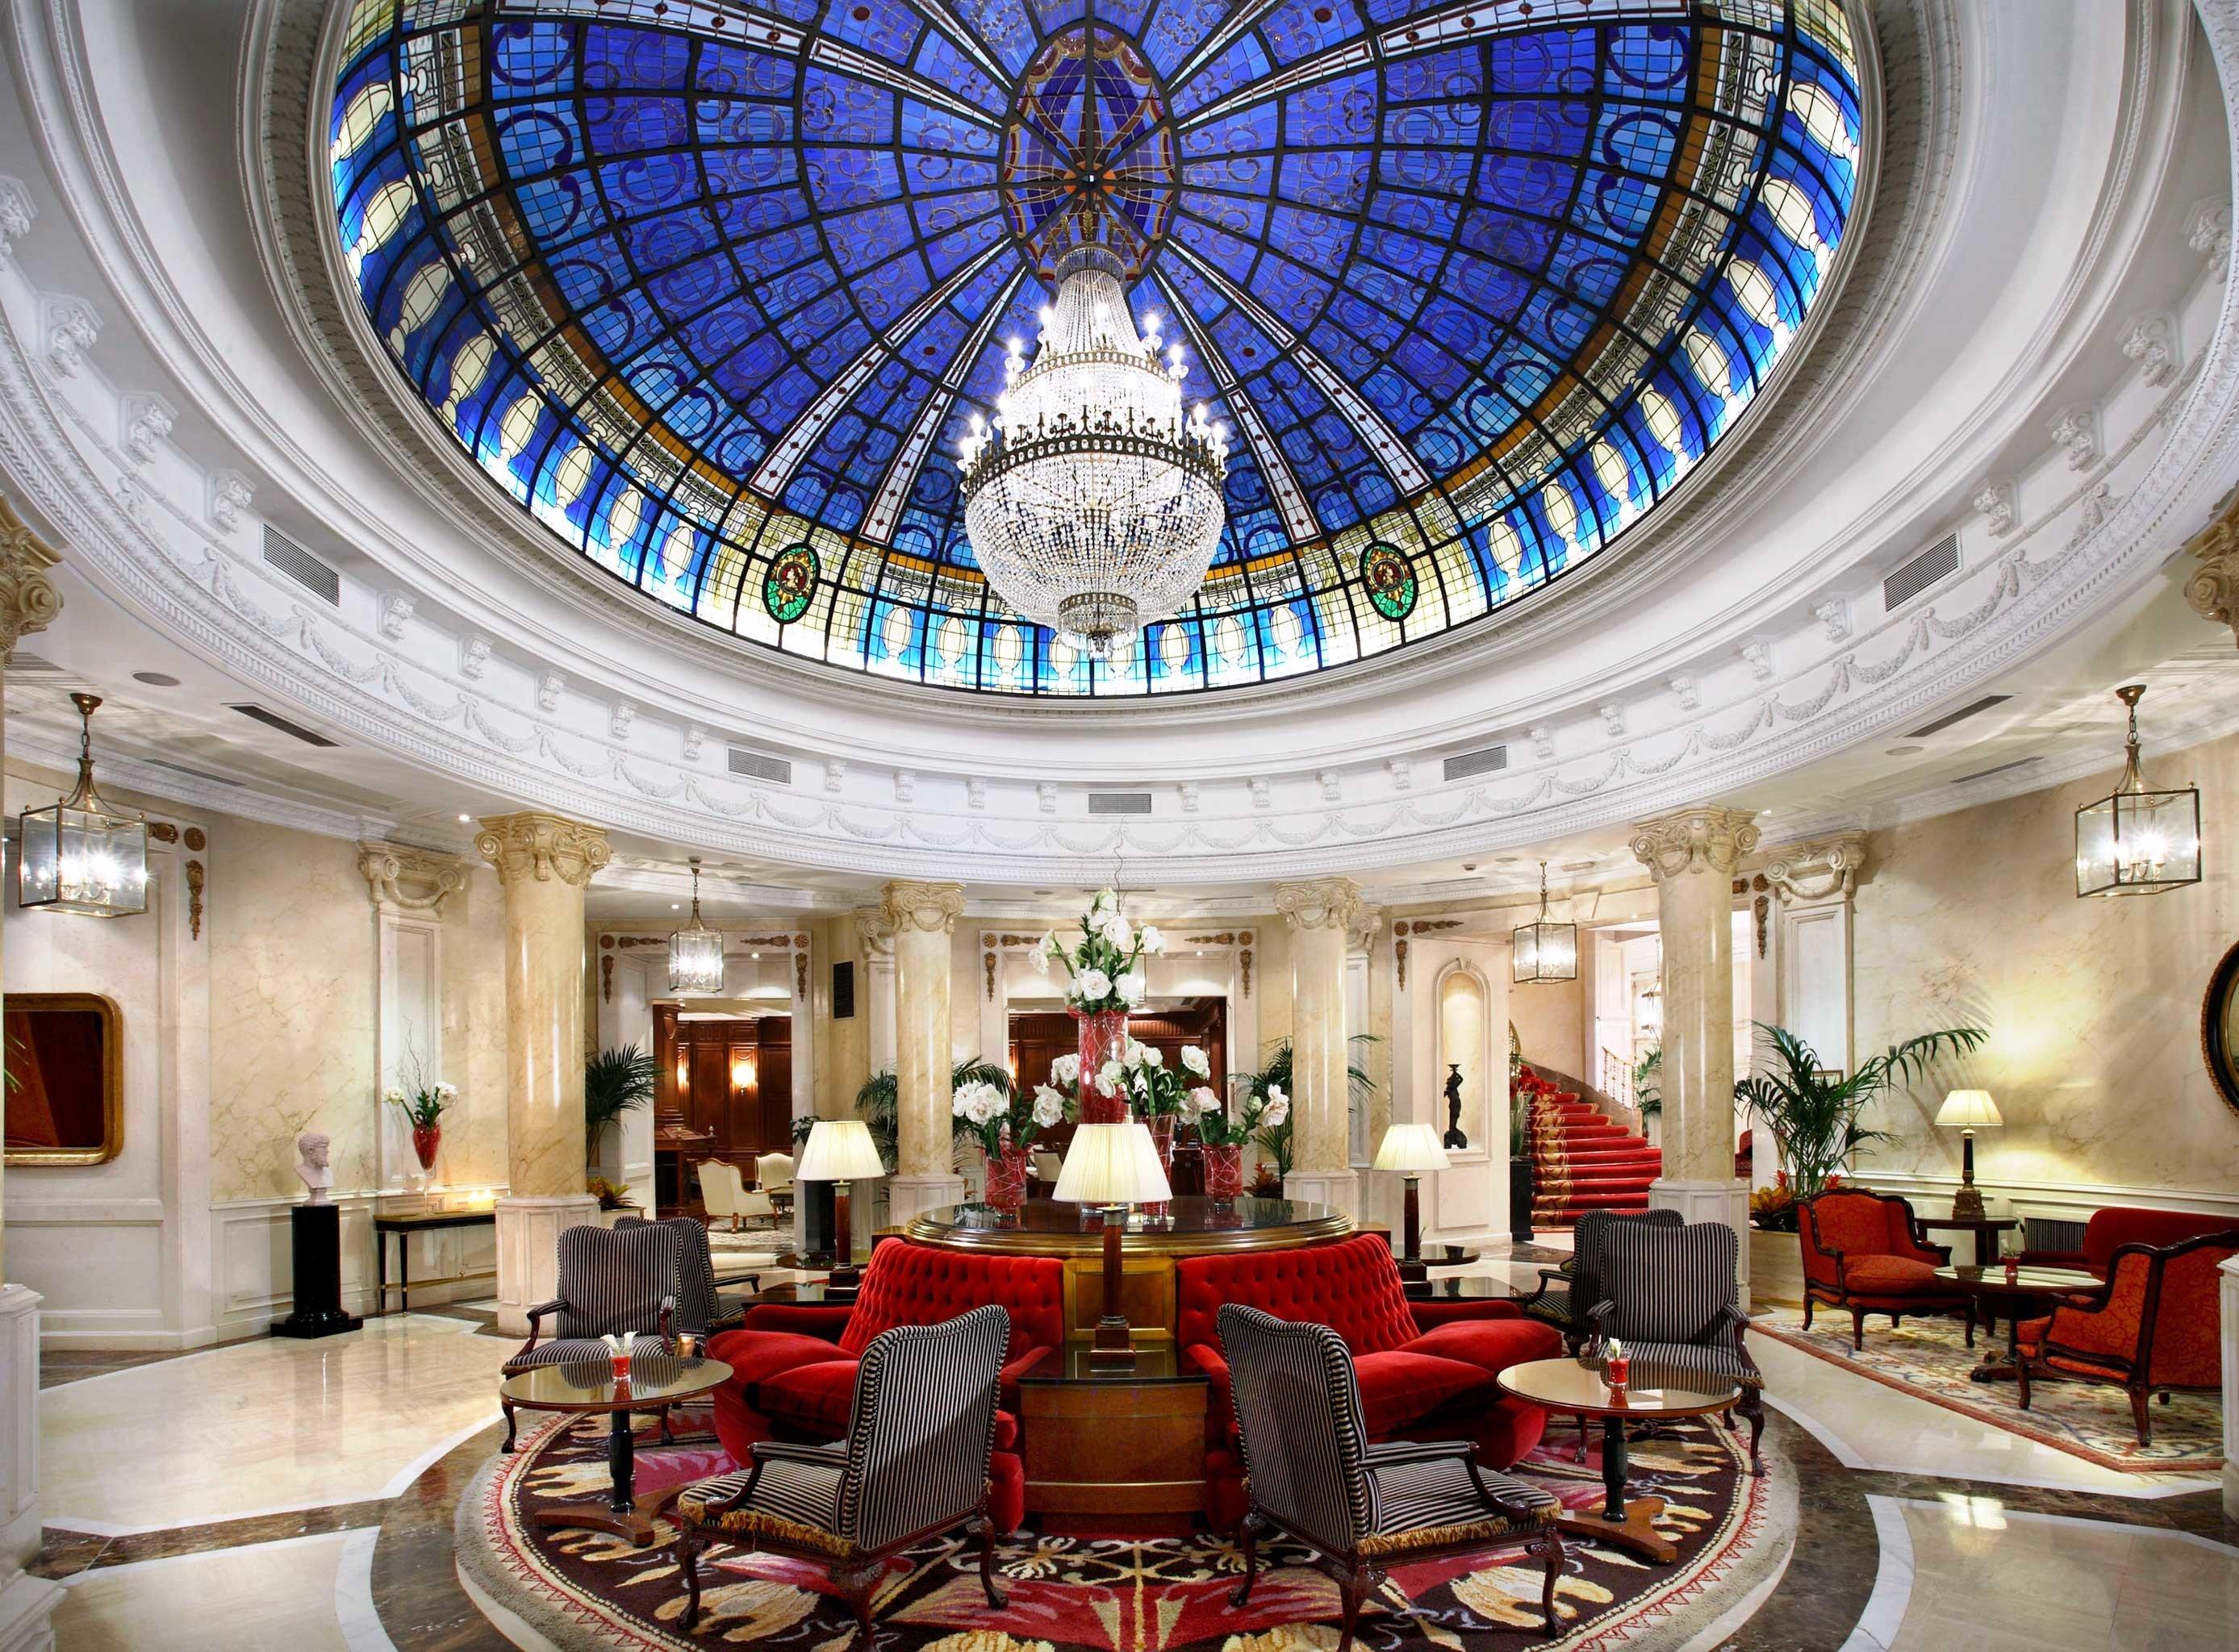 City Classic Elegant Historic Lobby building function hall palace ballroom theatre